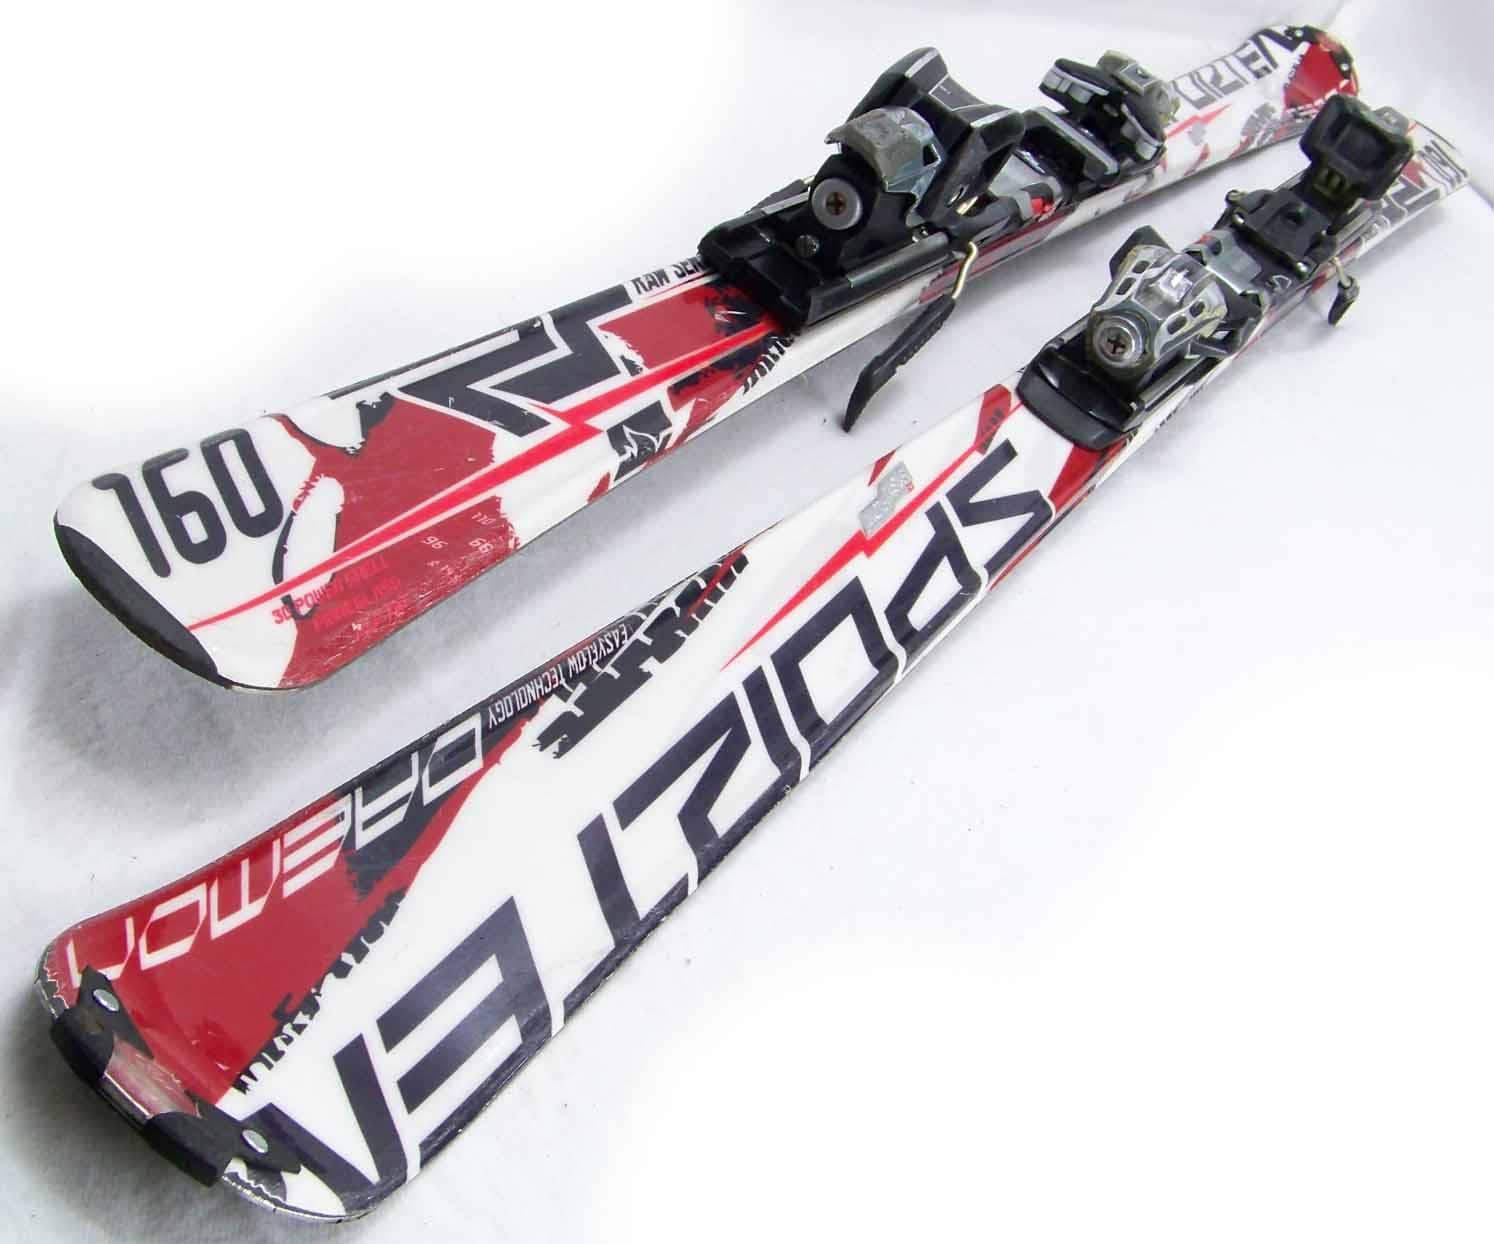 Sporten damon allround carver skiset cm alpin skier